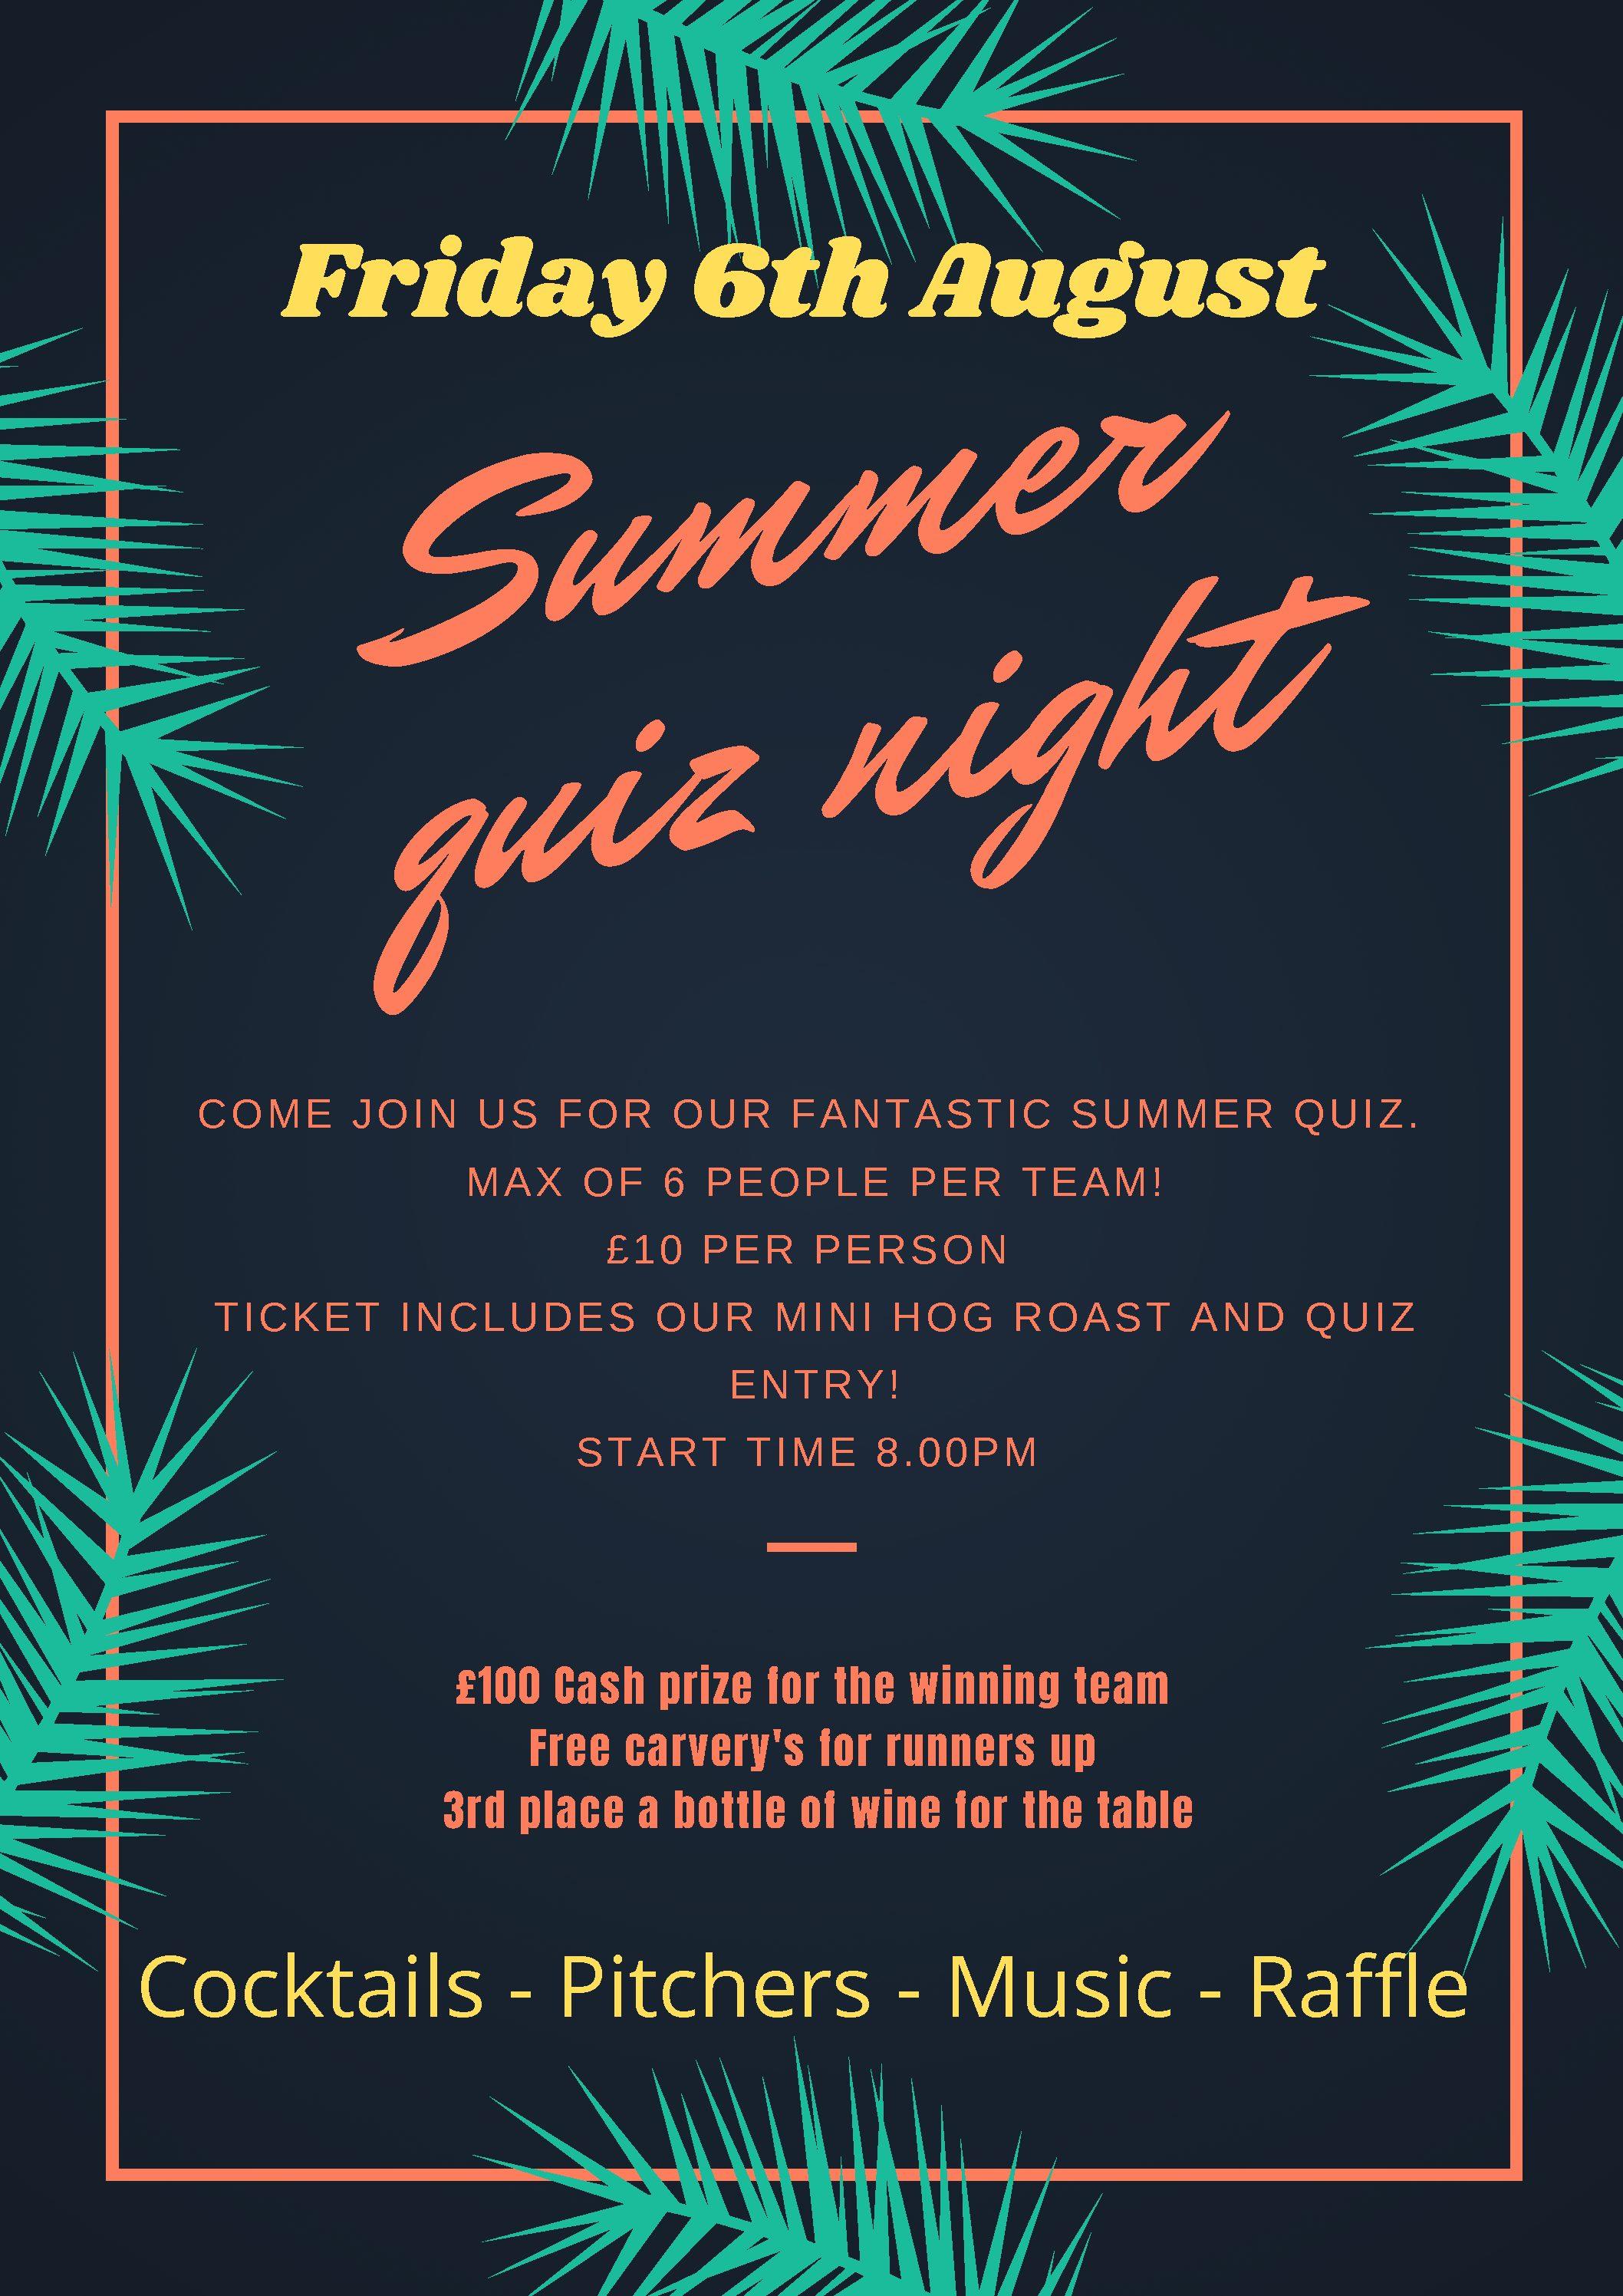 Summer quiz night. (1)